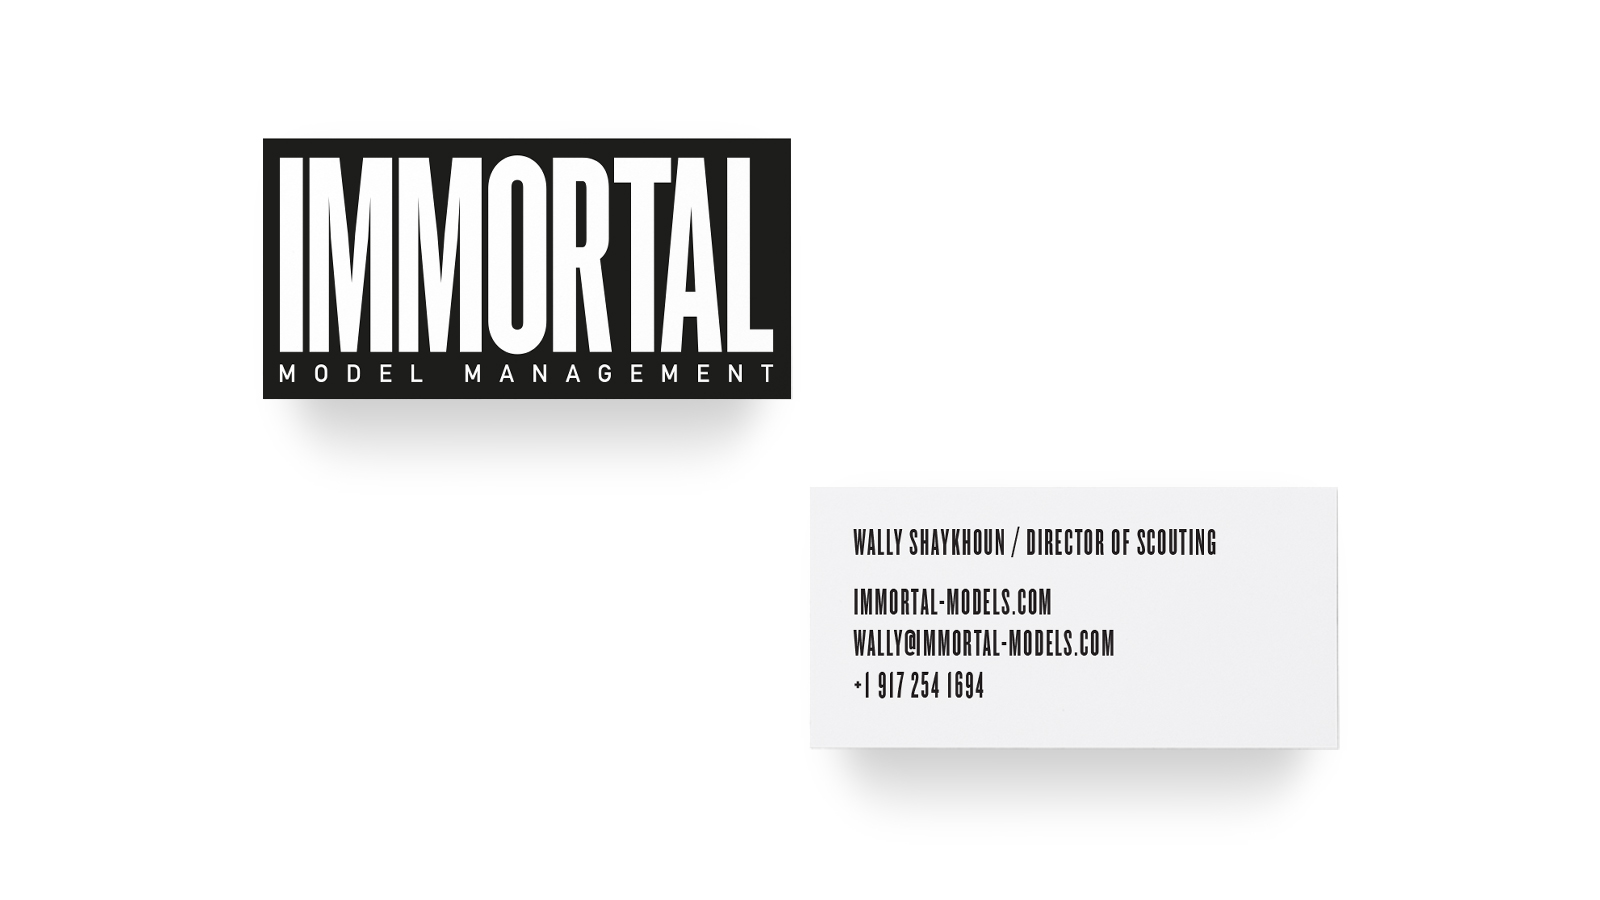 2_immortal